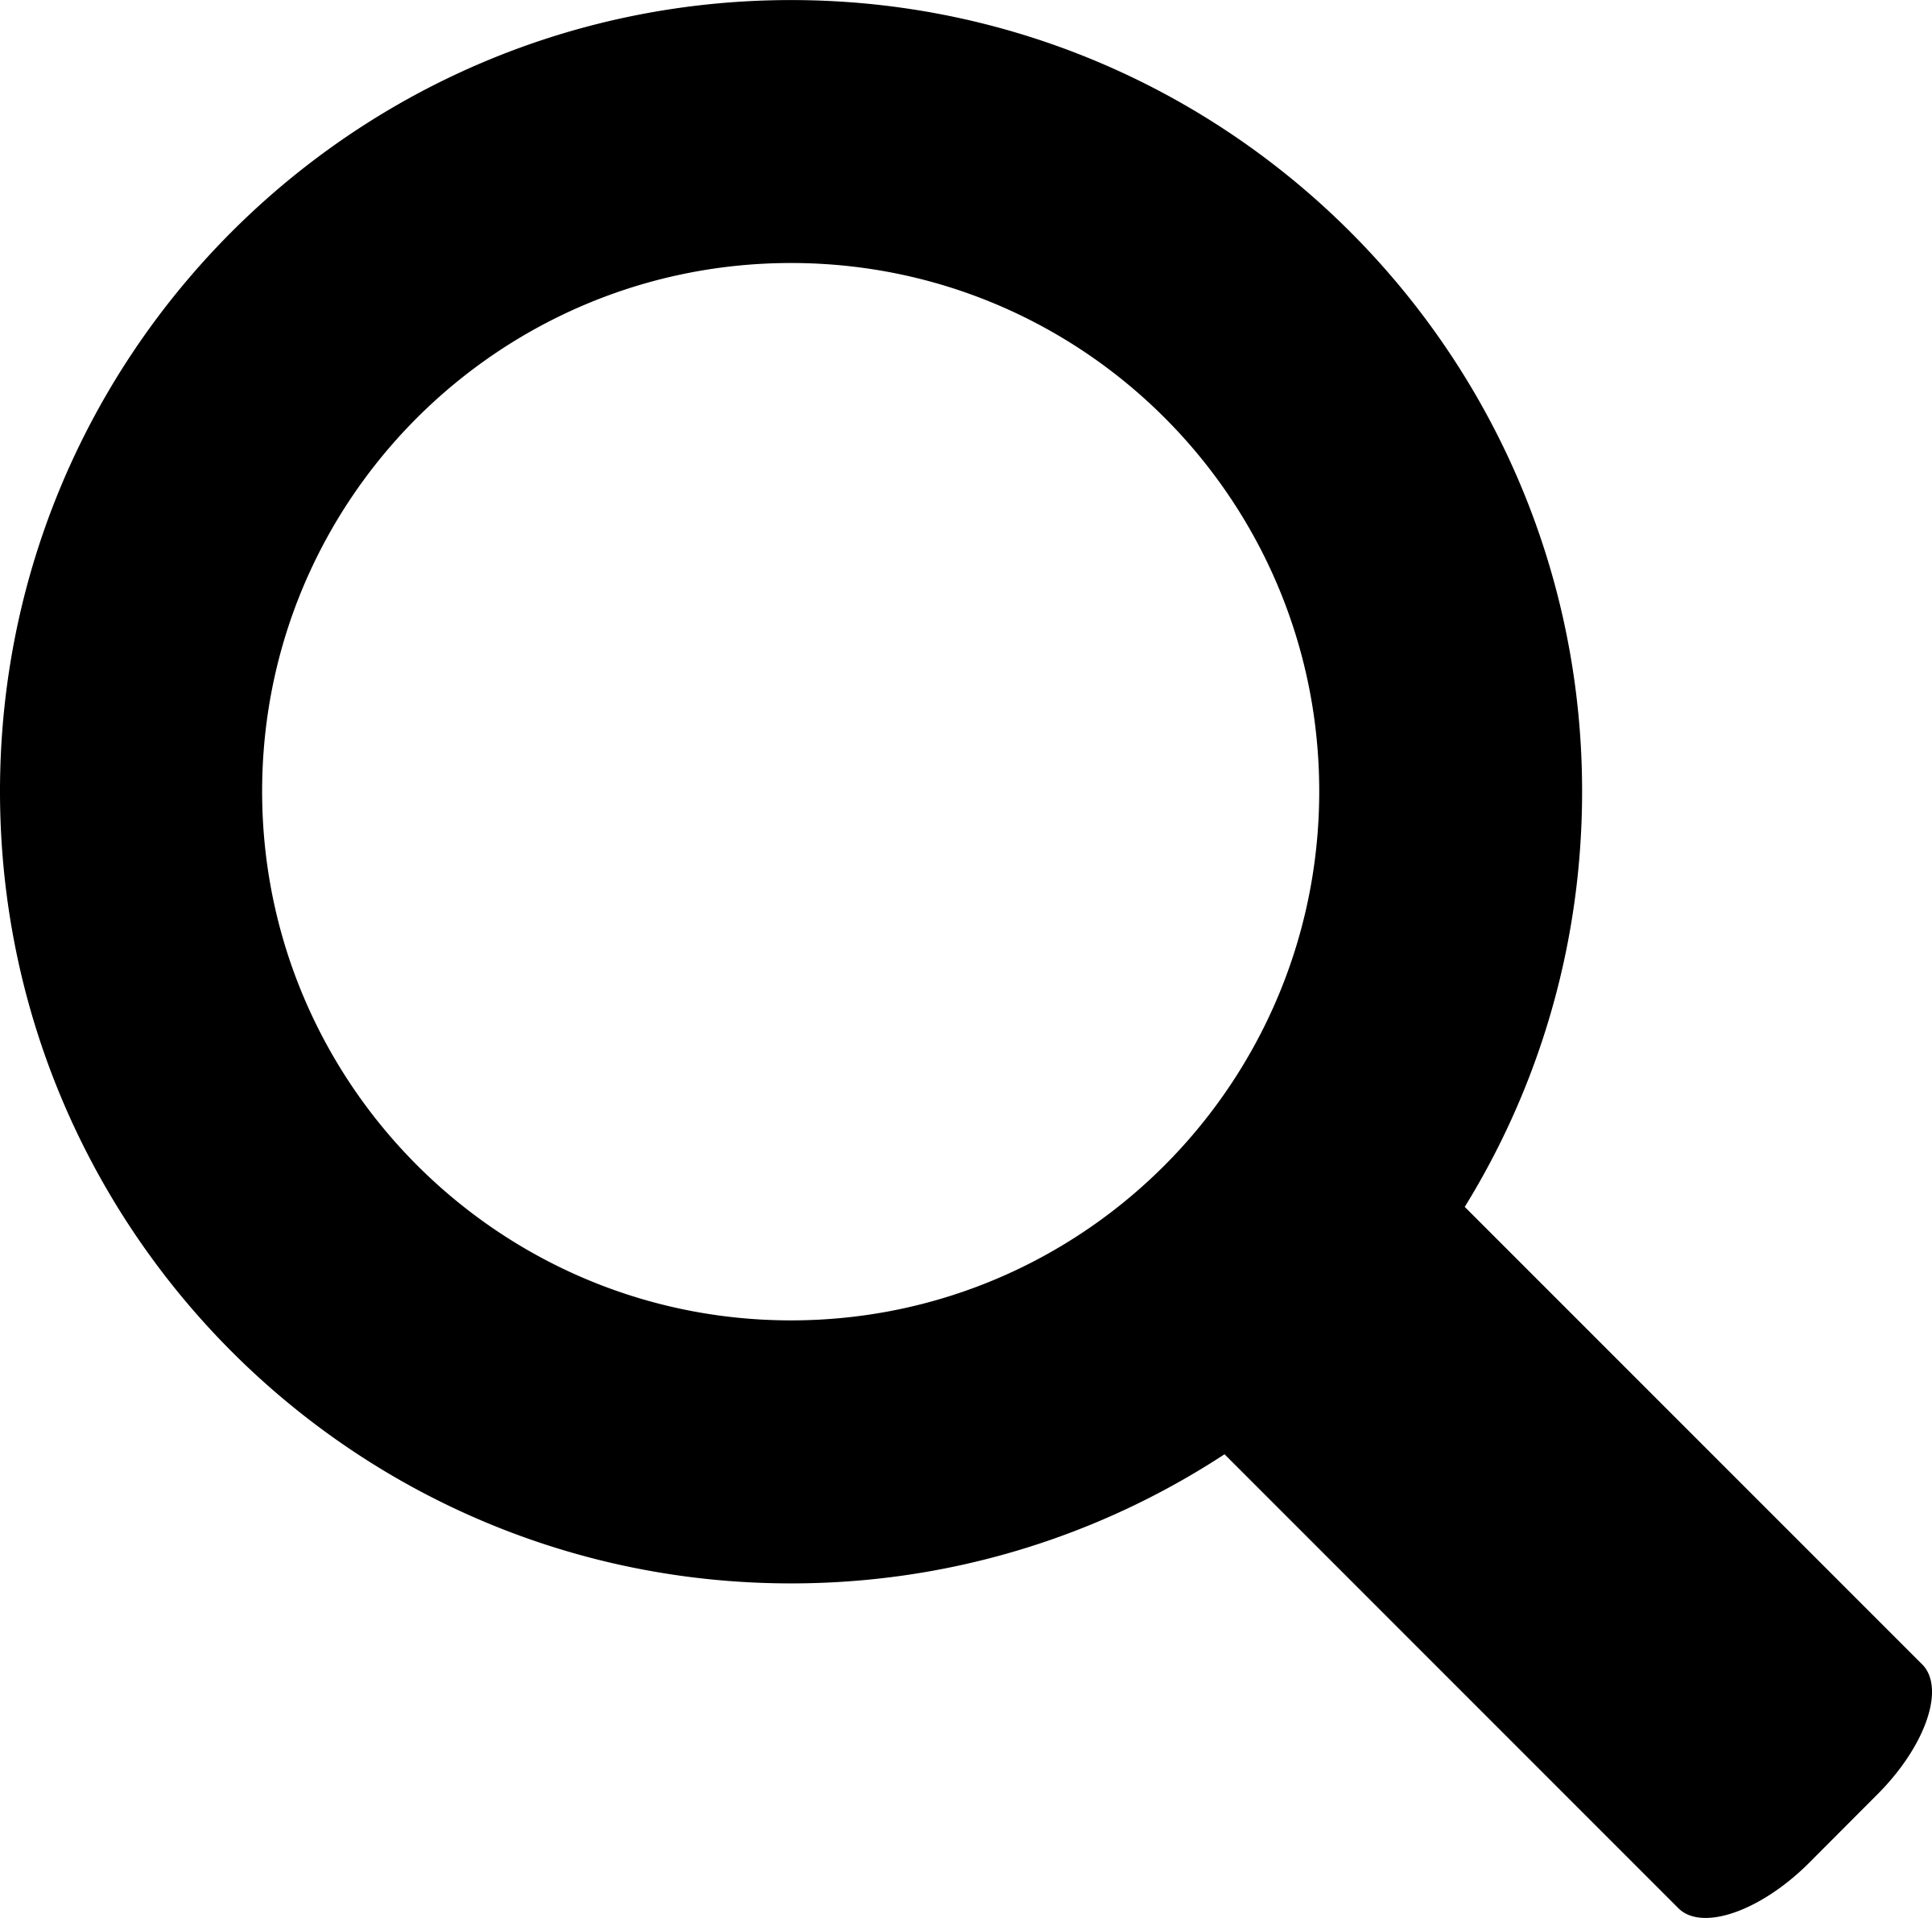 Search Icon Clipart - Clipart Kid